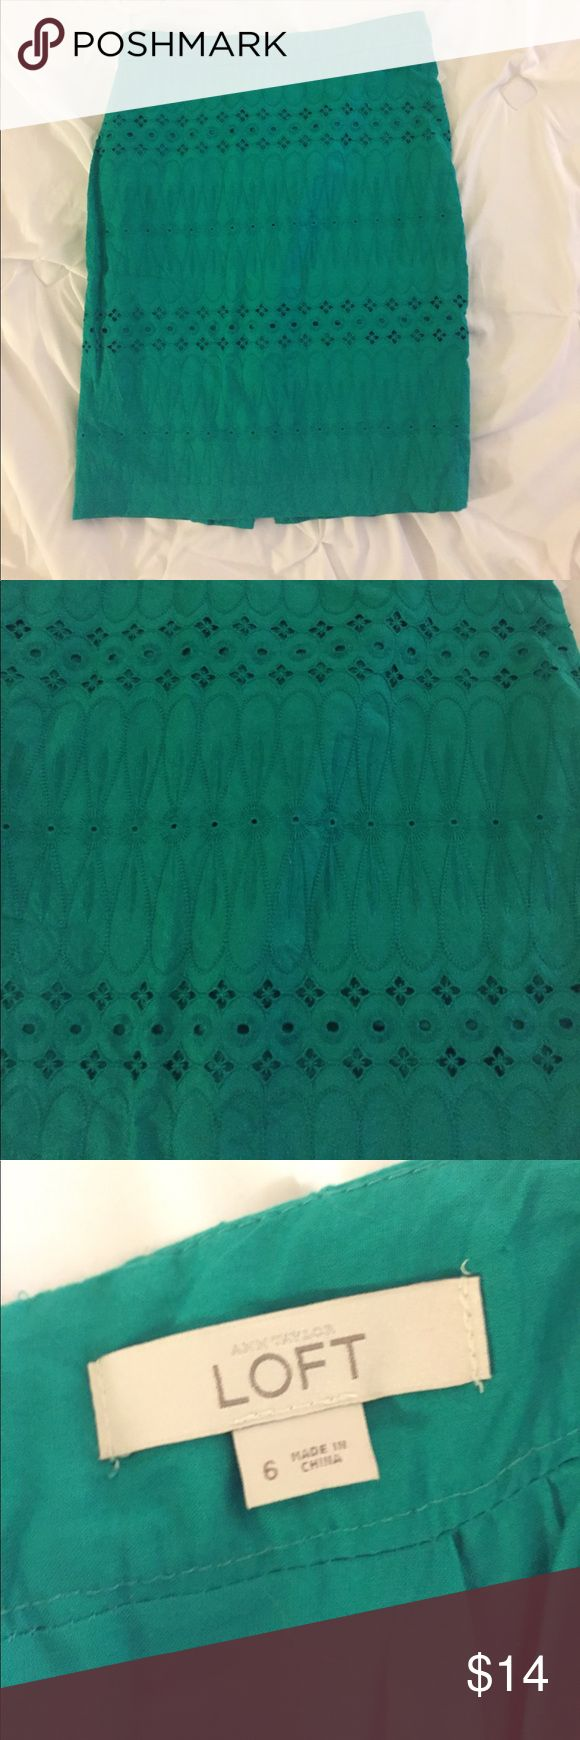 Loft Green Pencil Skirt Very good condition!  Bright green color. LOFT Skirts Pencil